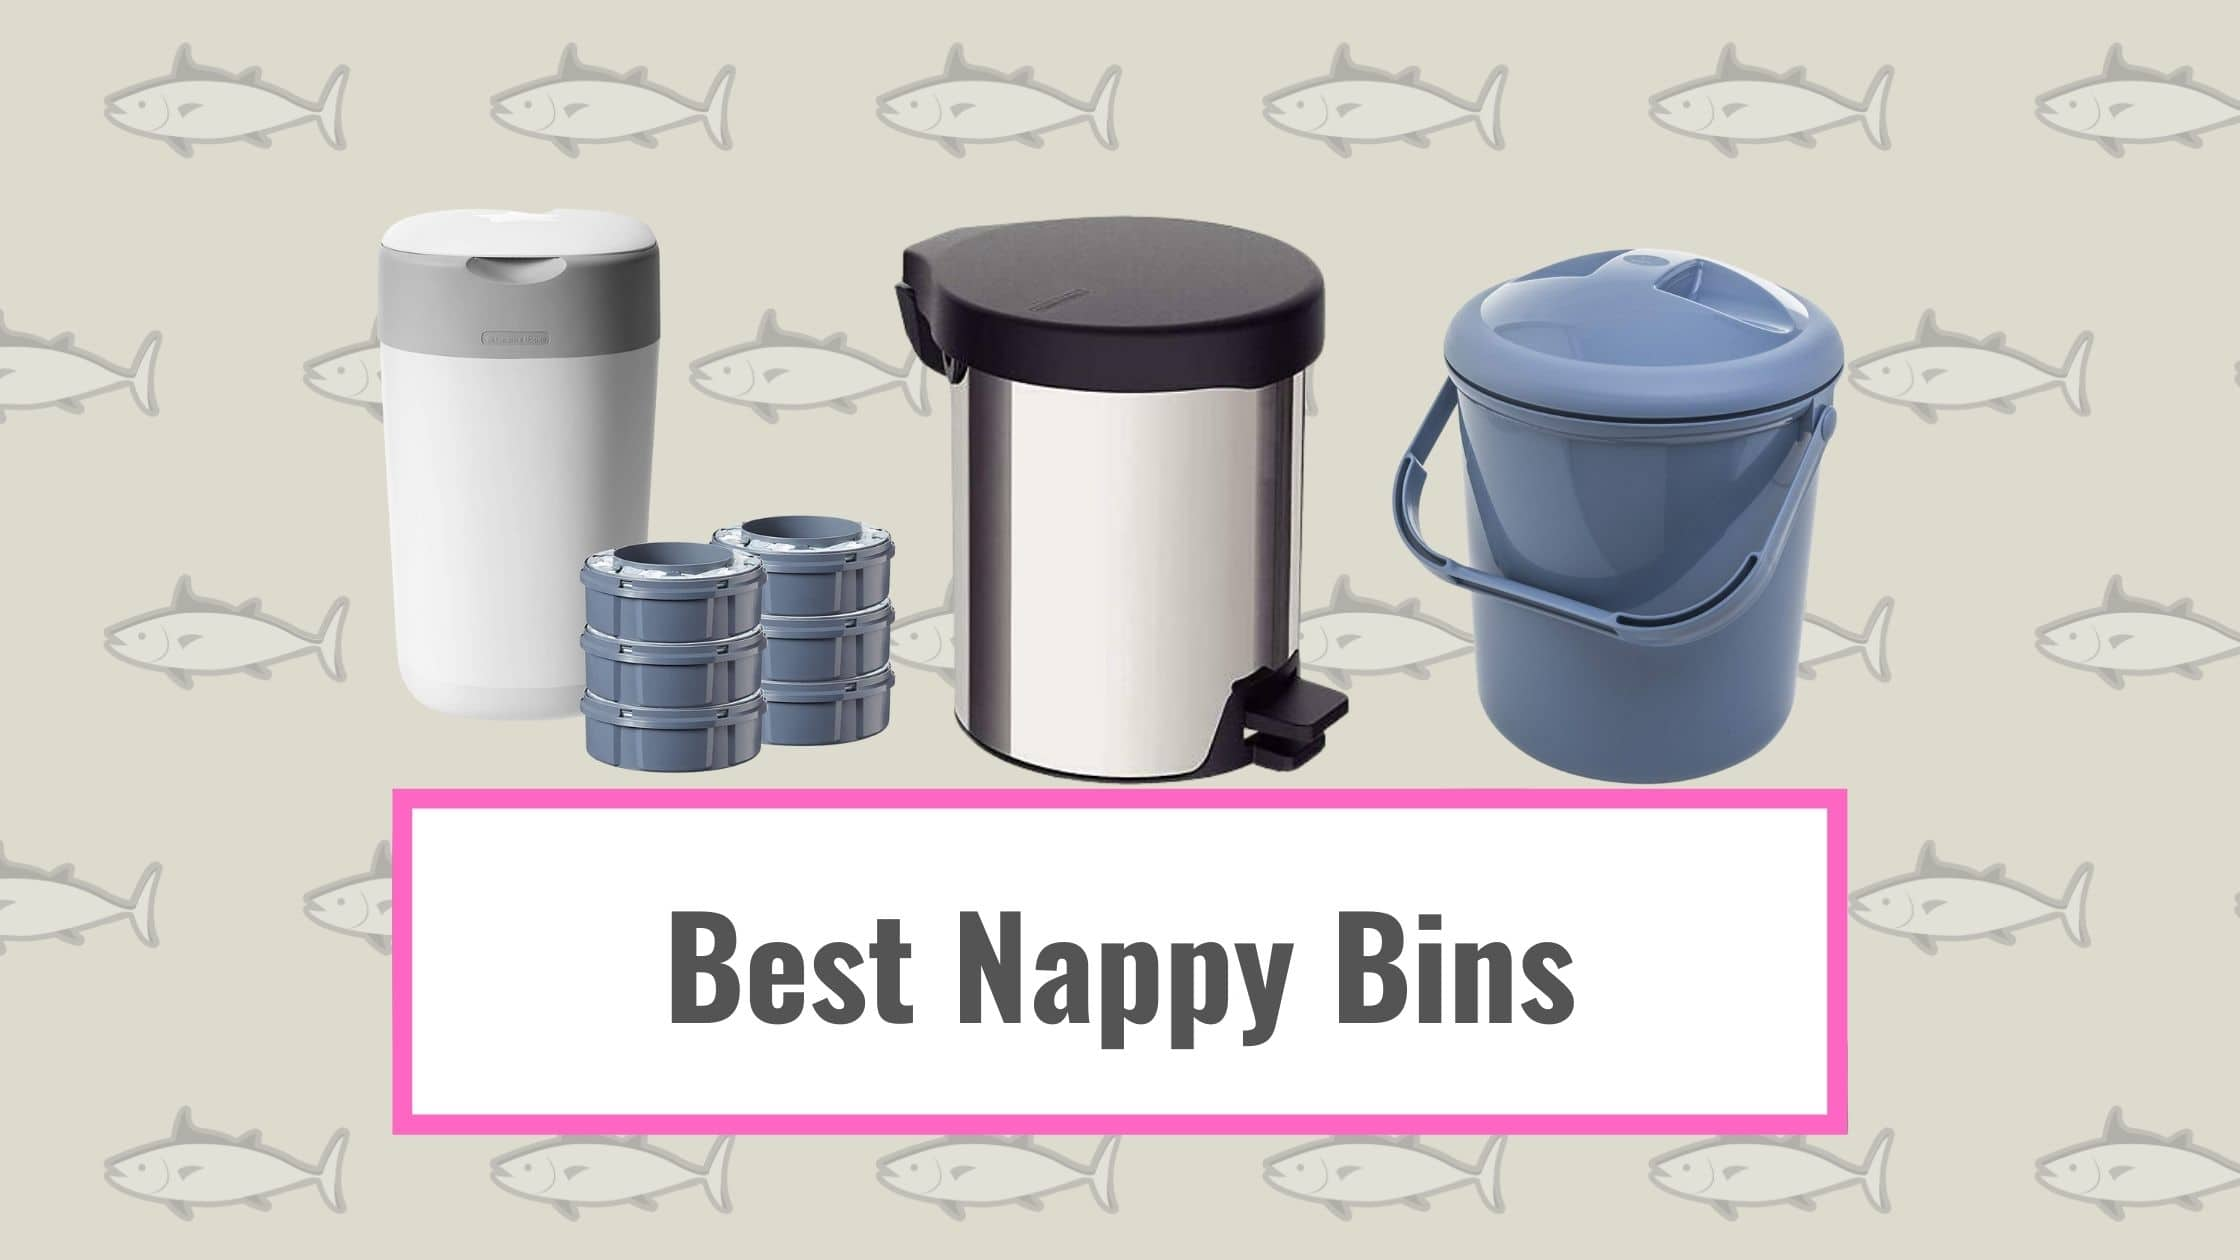 Best Nappy Bins